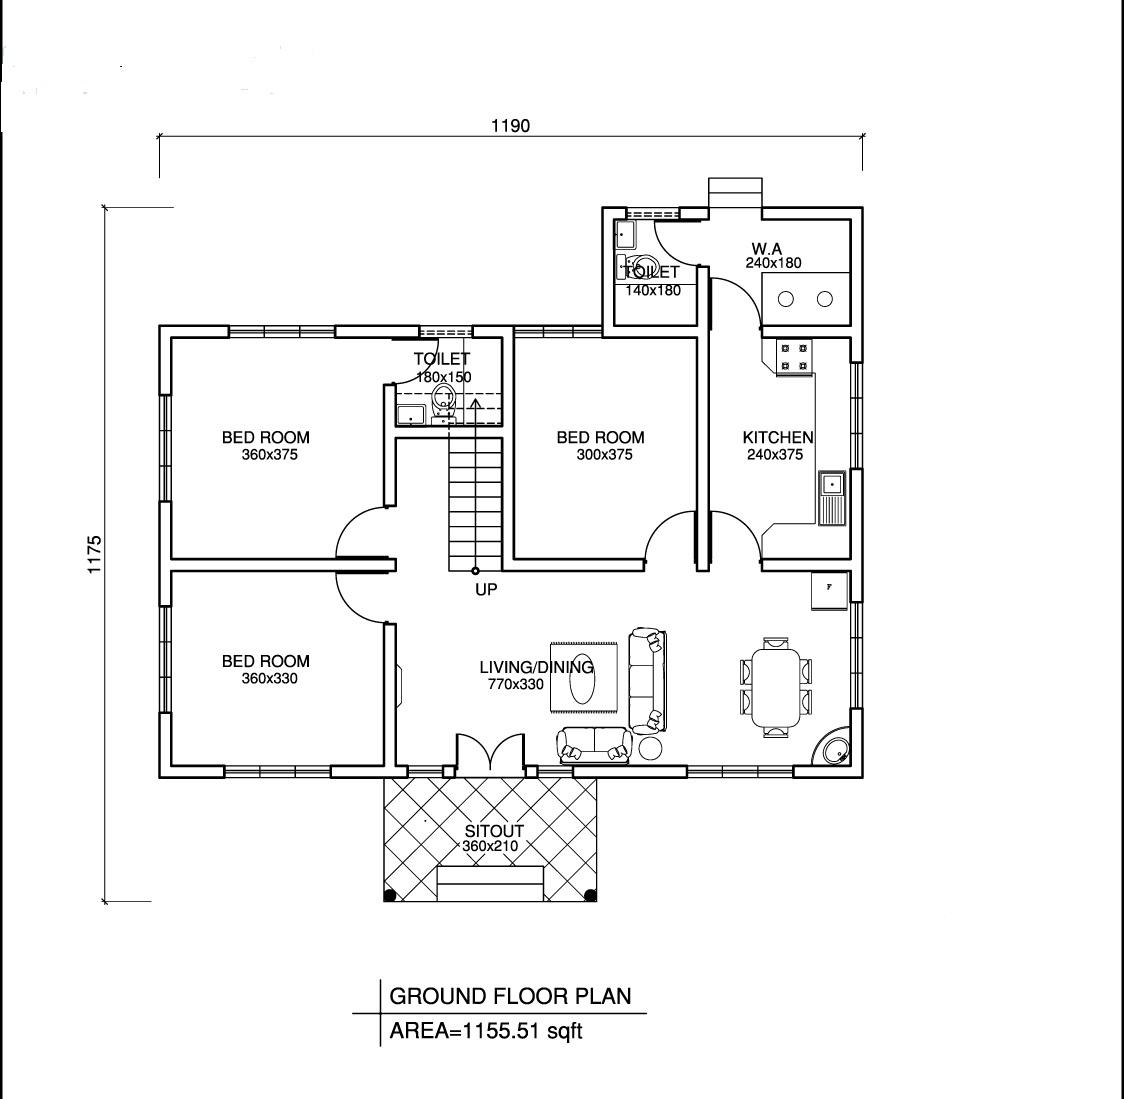 Sciensity Floor Plan Autocad Design